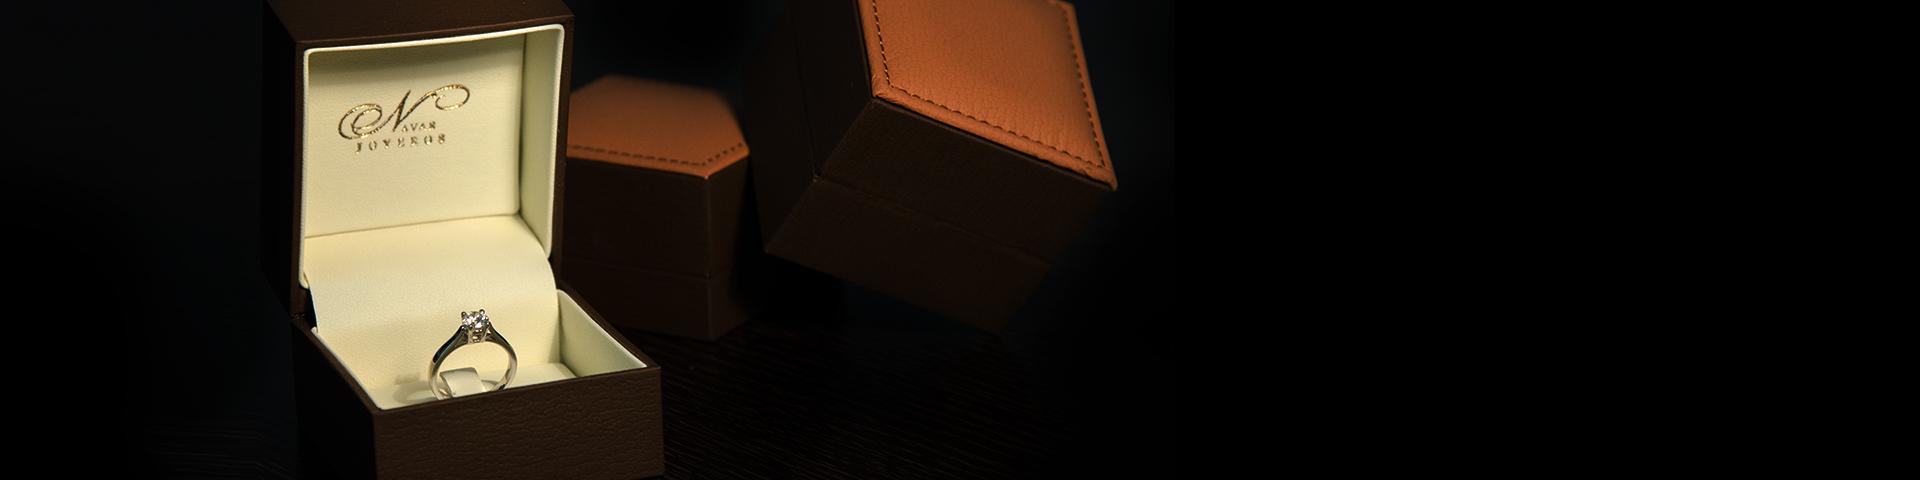 Slide1920x480_cajas